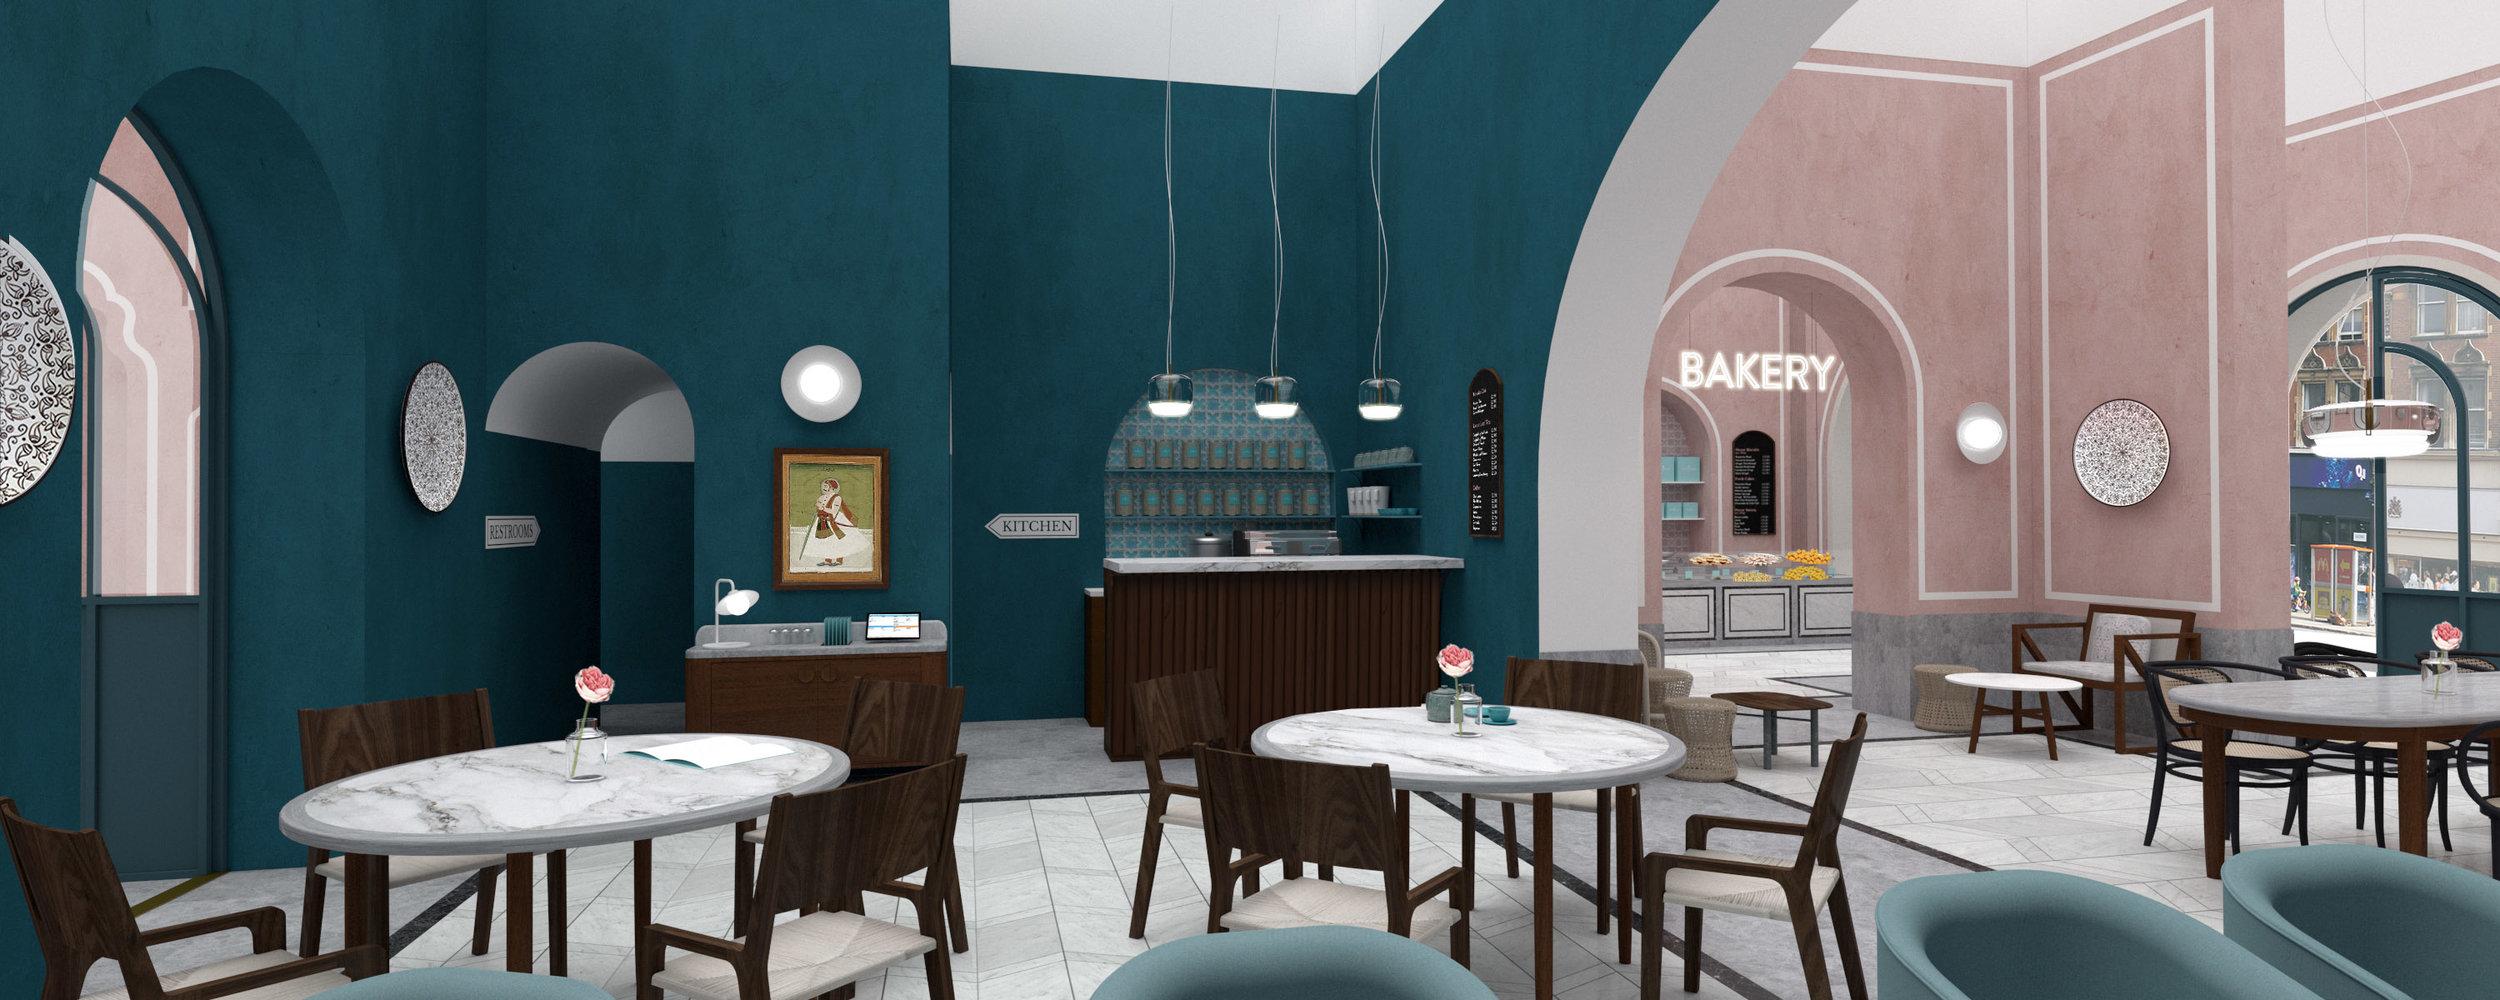 lunarlunar_interior_design_cafe_bakery_restaurant_pistachio_rose_seating_4.jpg